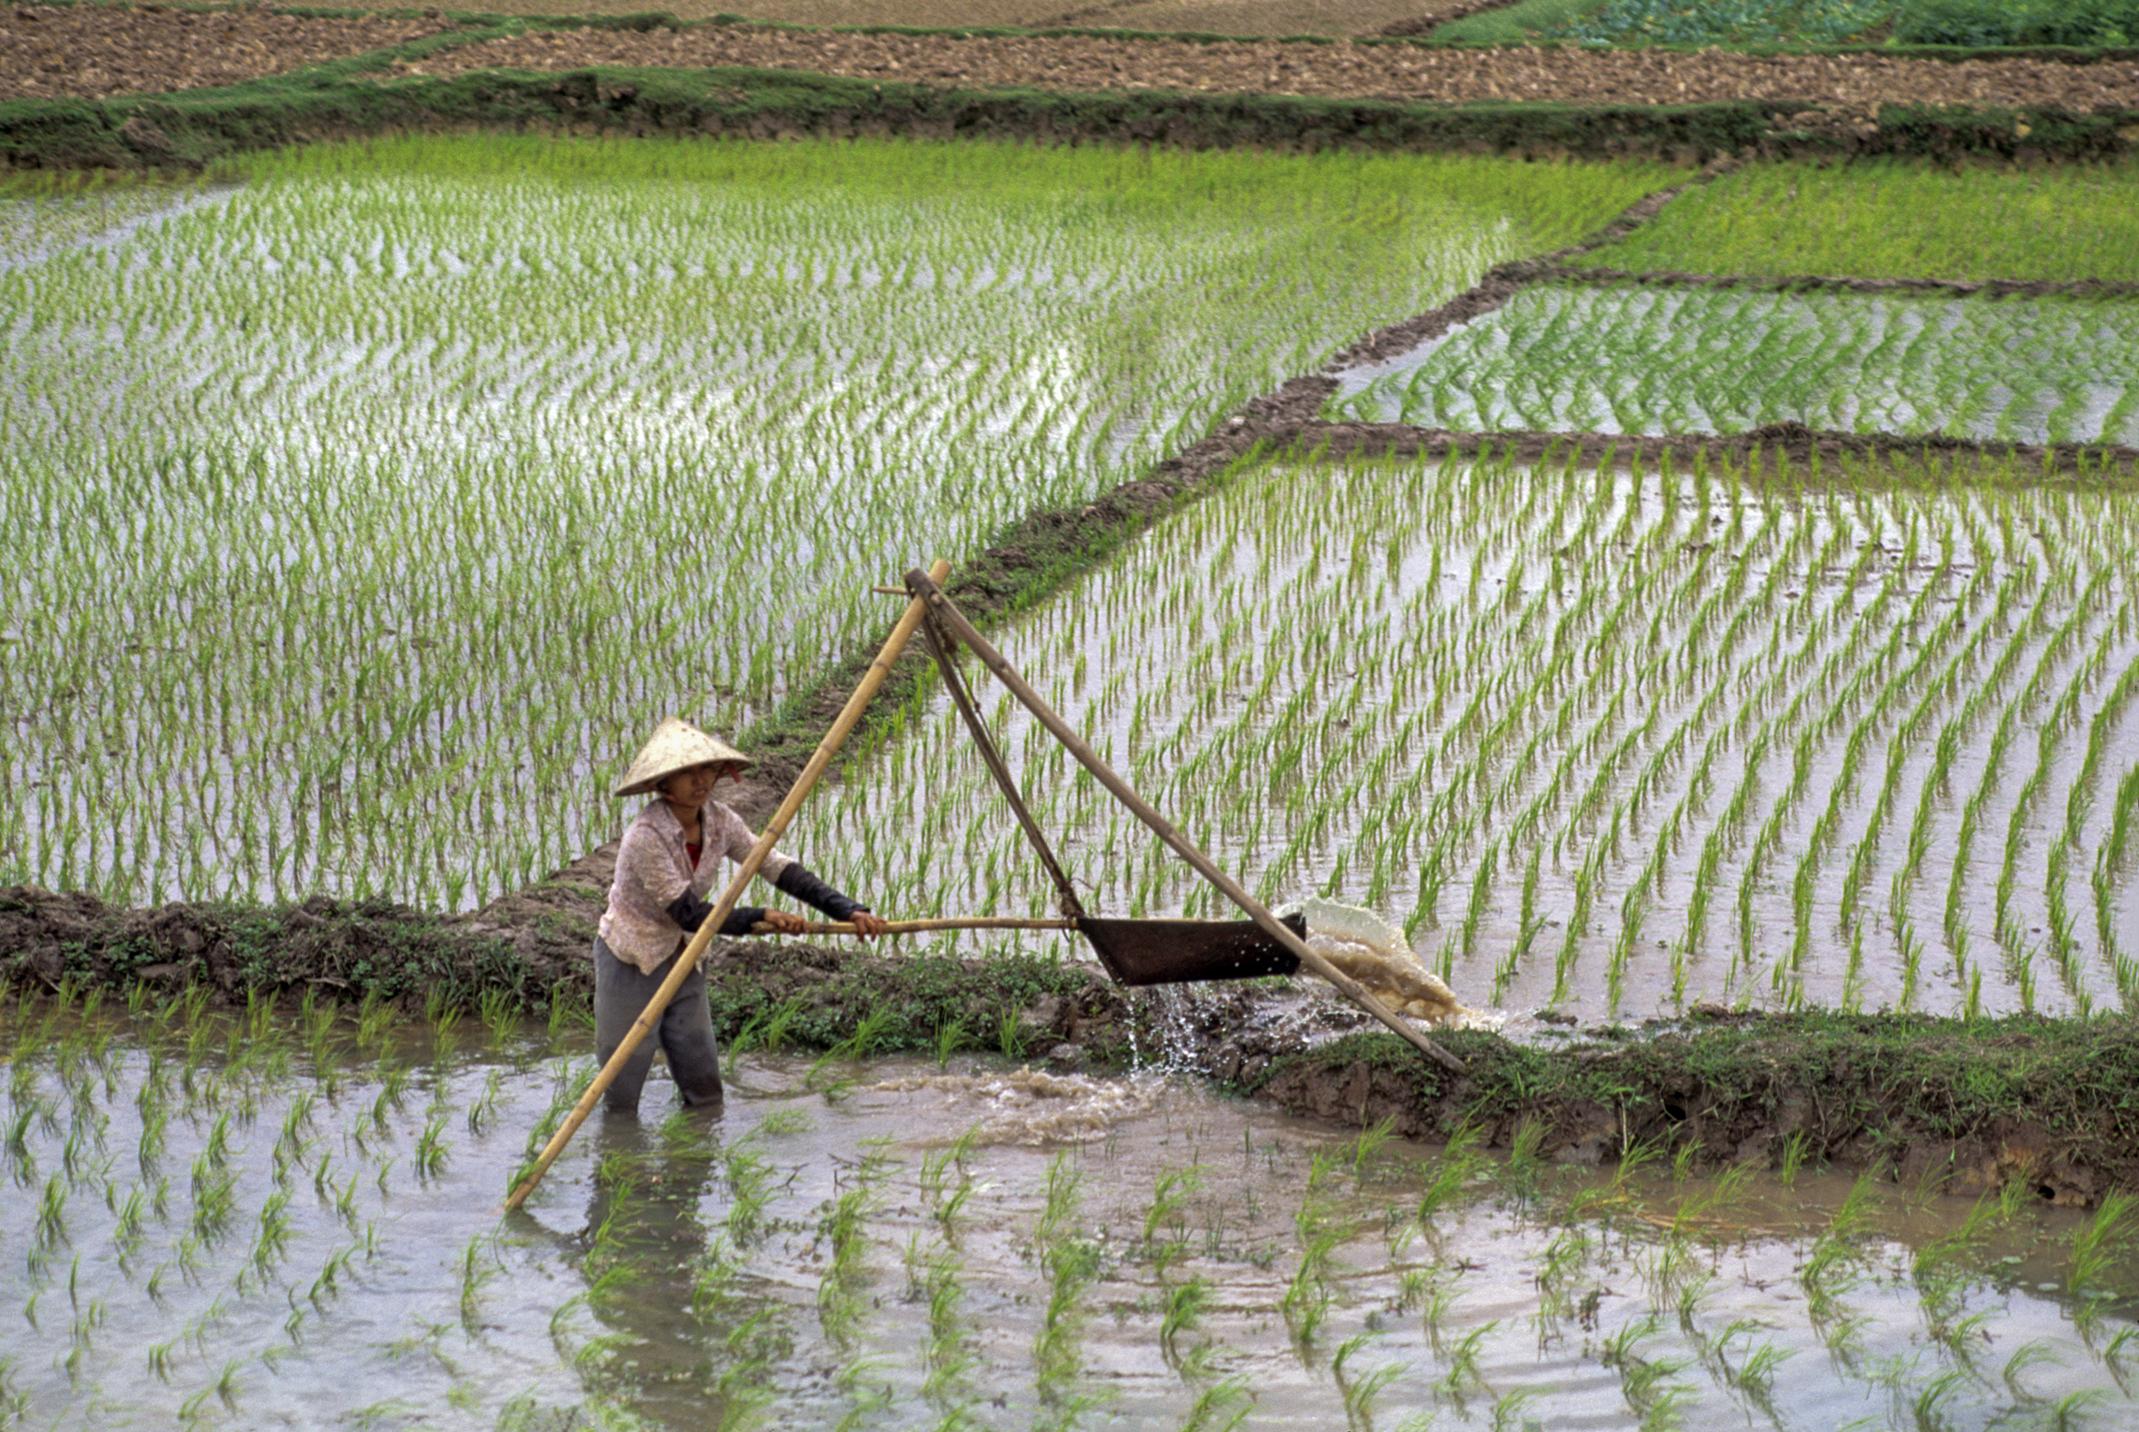 Halong, Vietnam. 1993